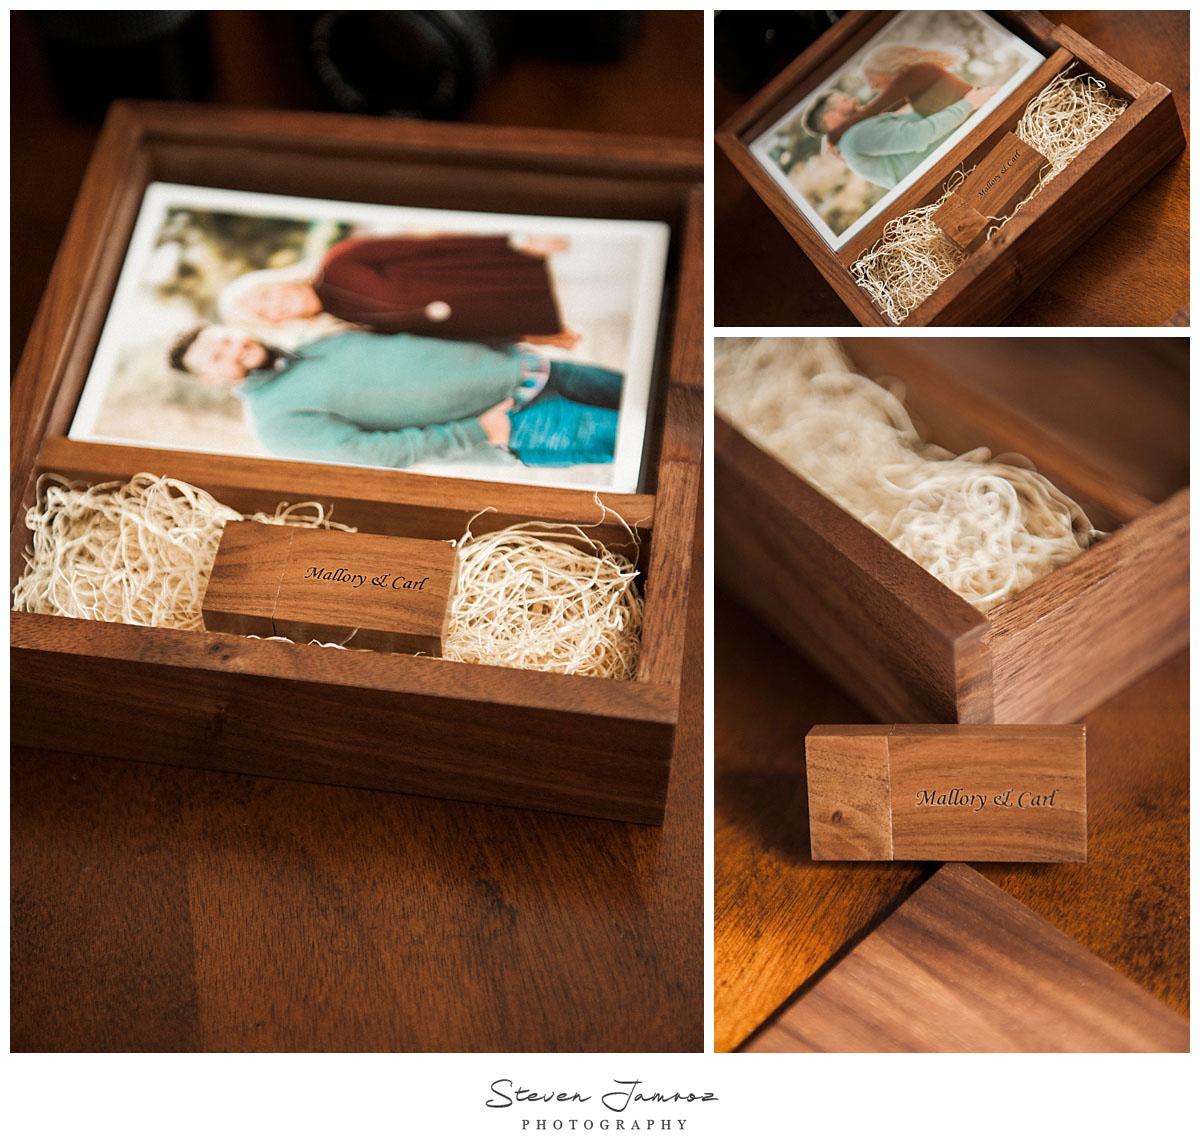 steven-jamroz-photography-photo-prints-raleigh-photographer-0001.jpg